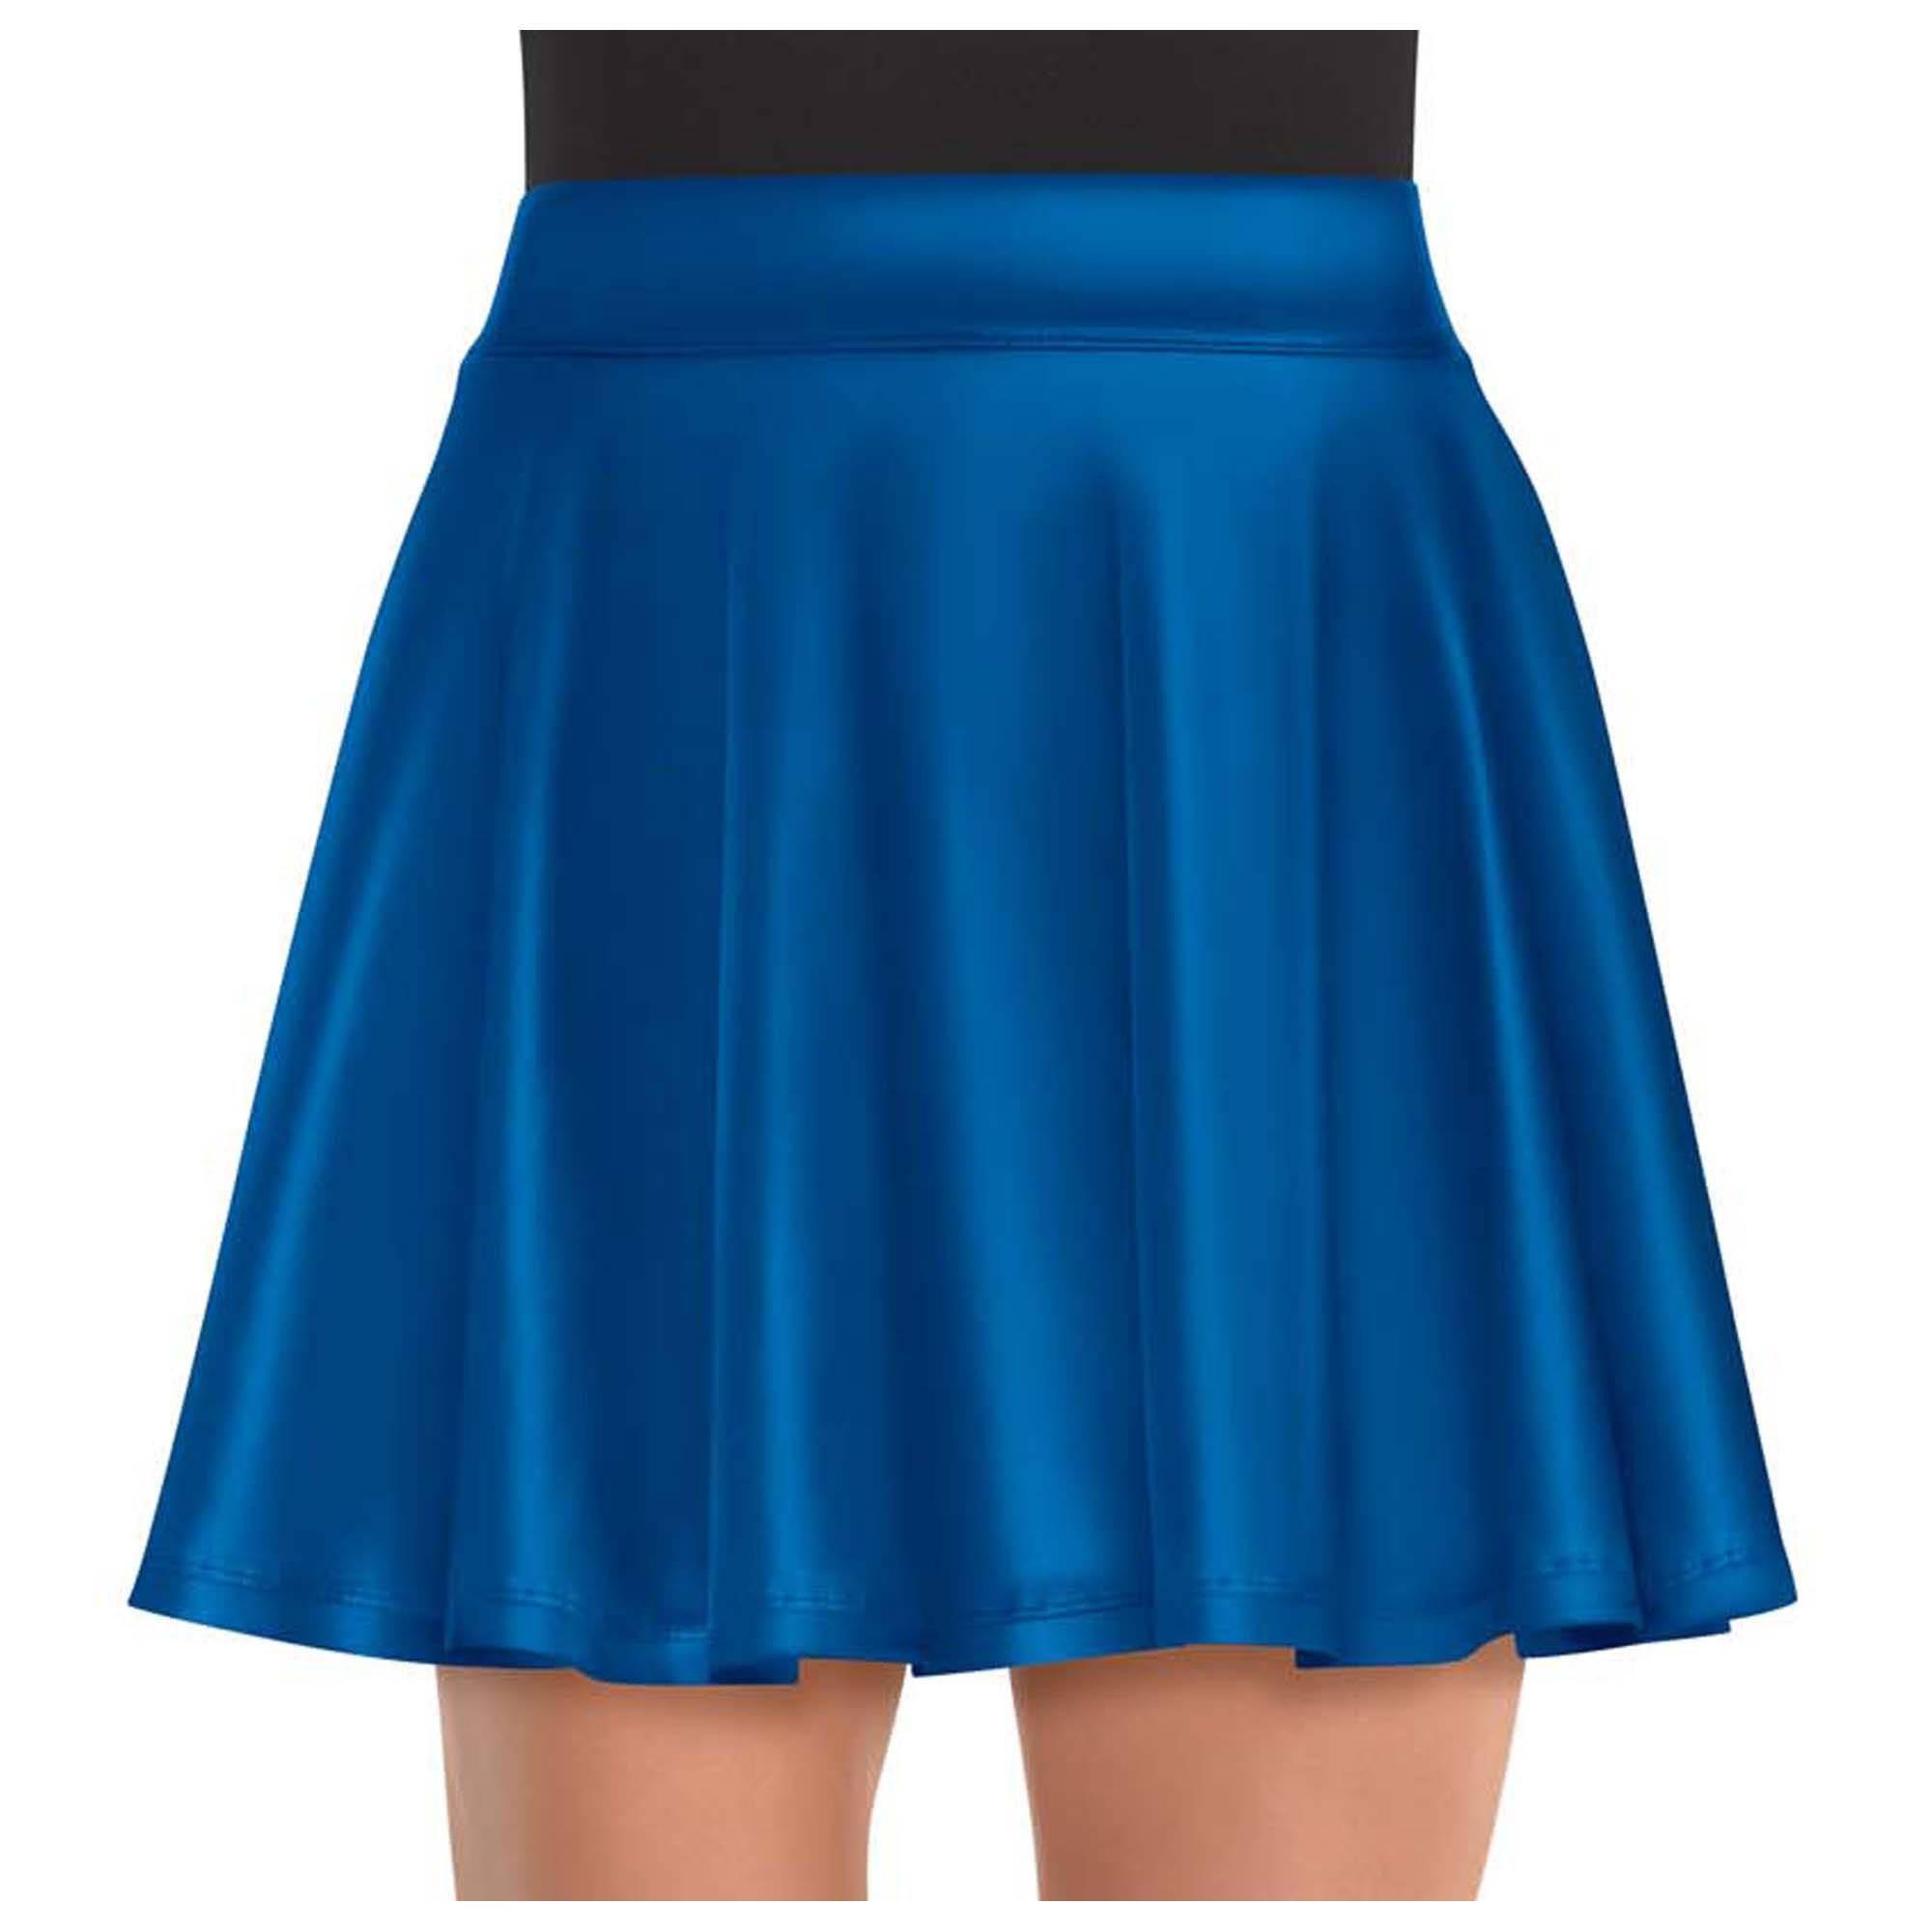 Halloween Women's Flare Skirt Halloween Costume - Blue, Women's